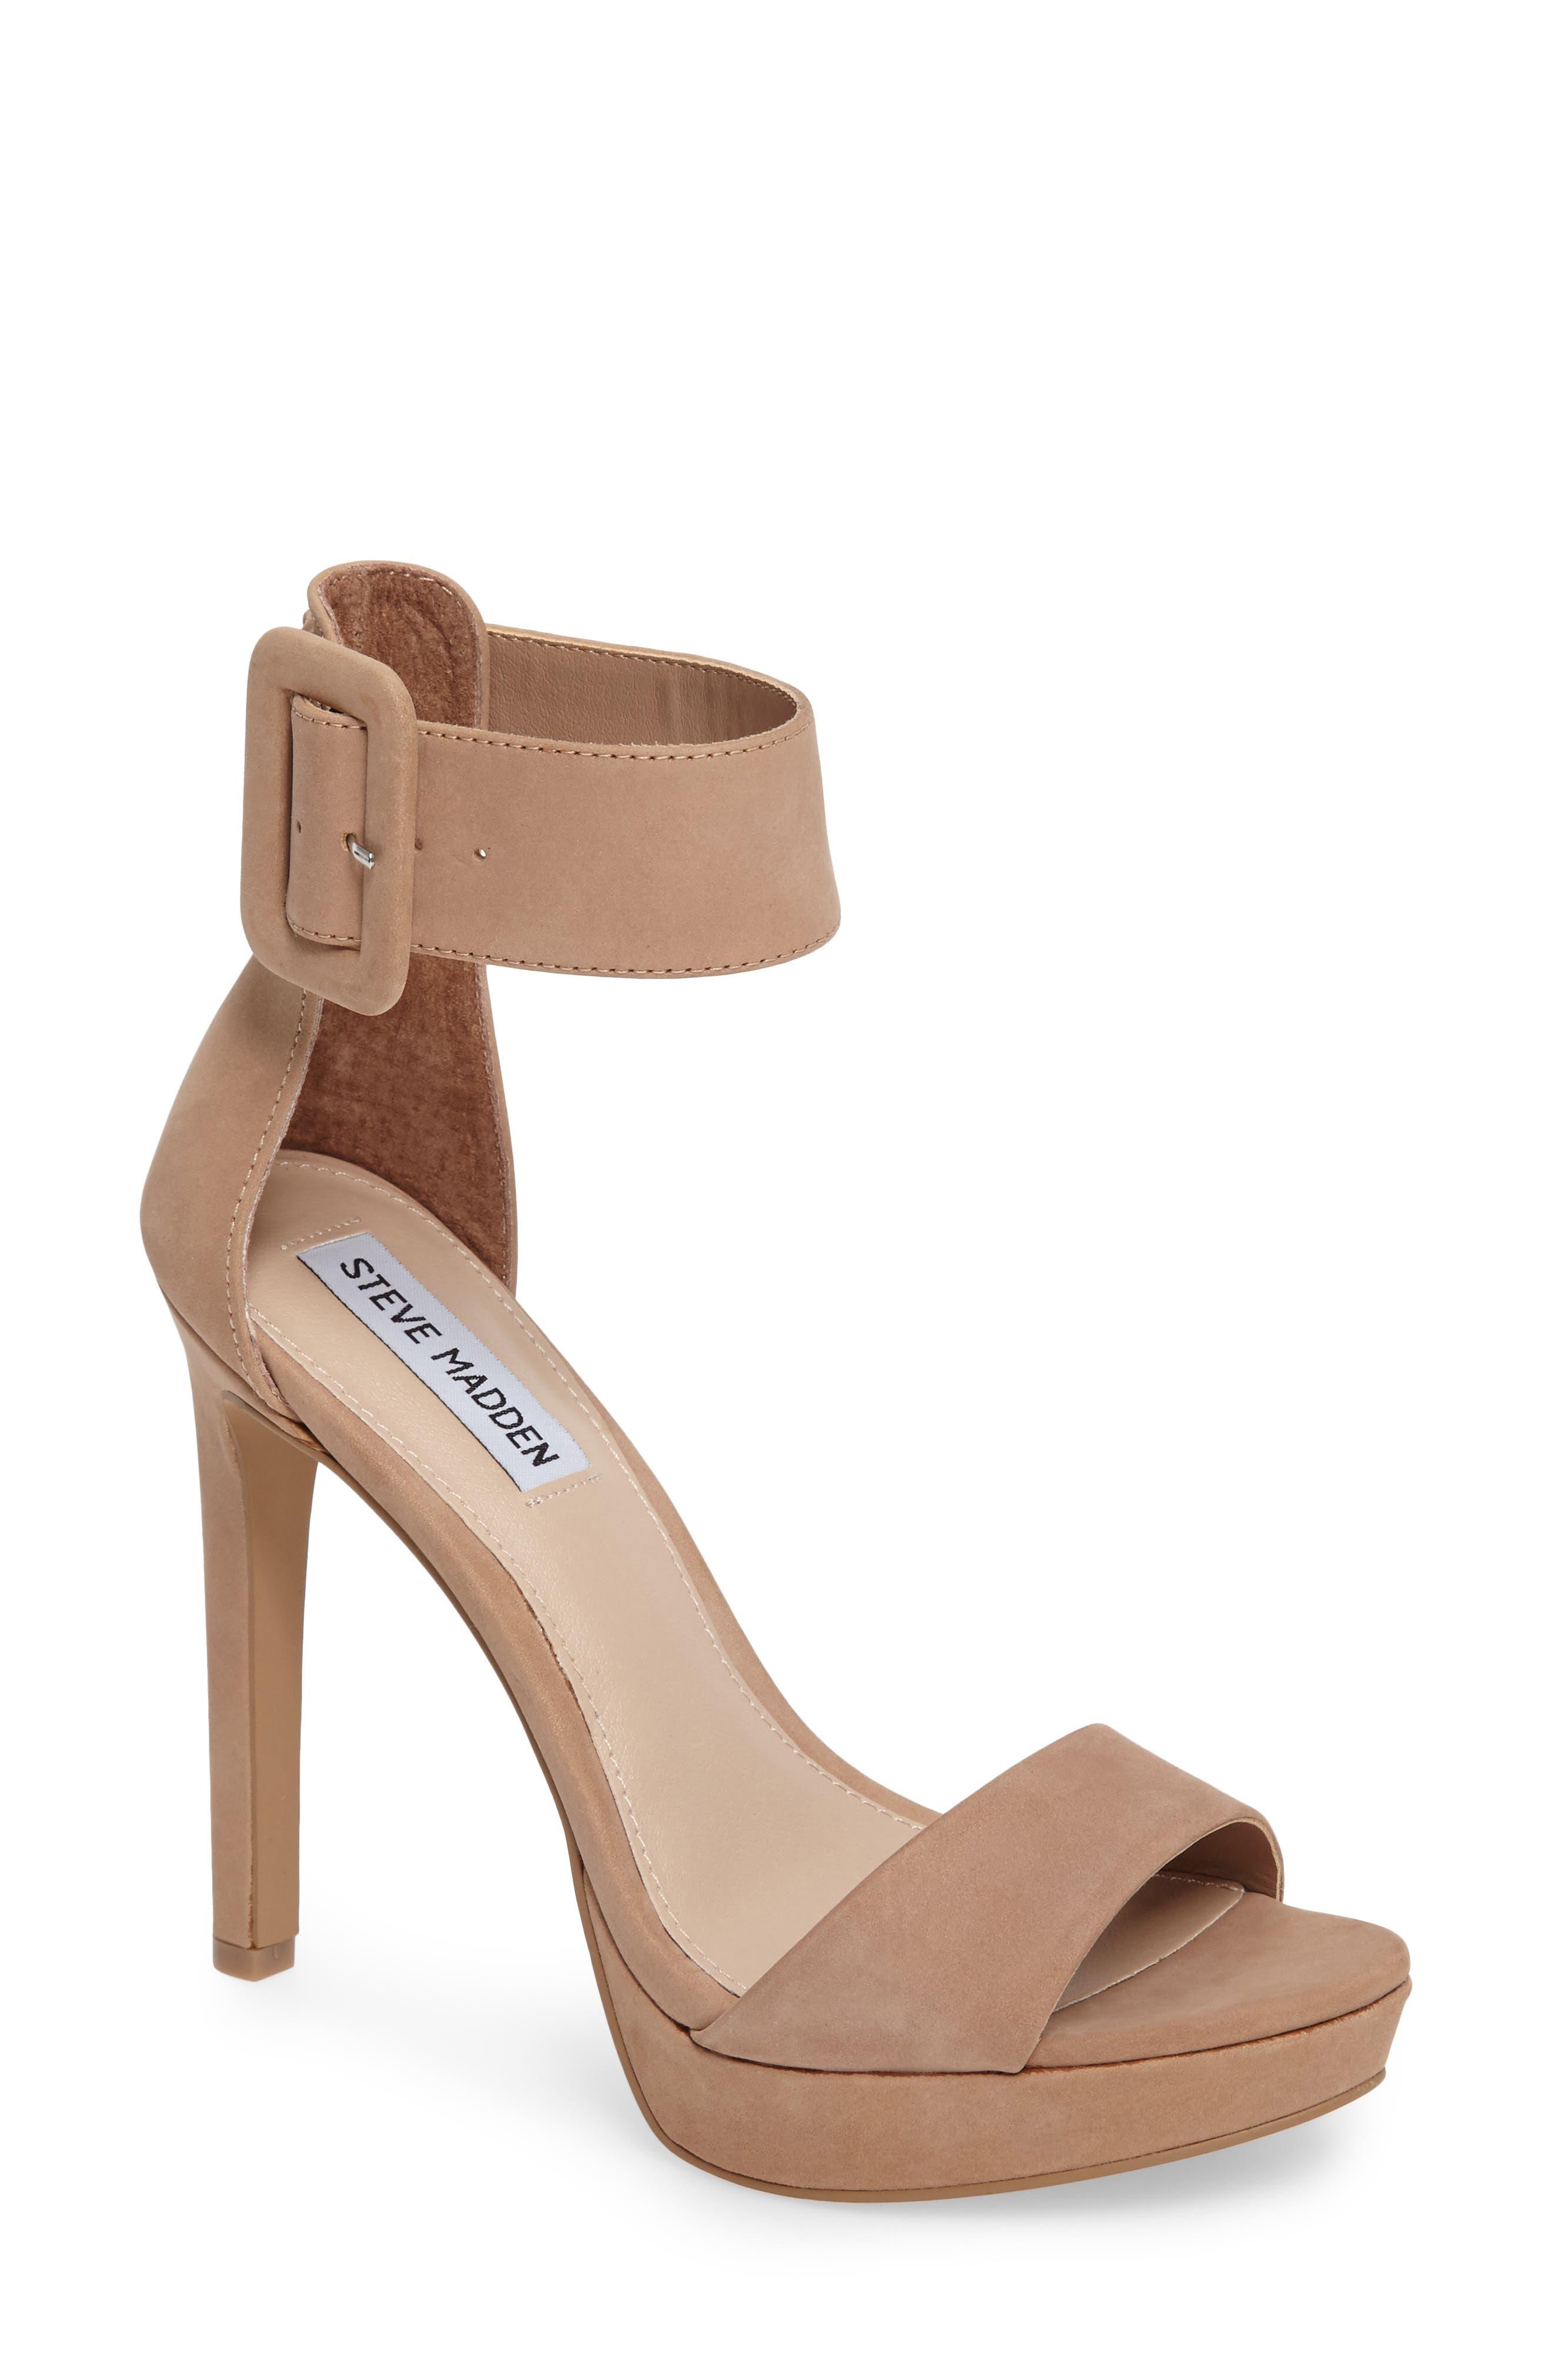 Circuit Sandal,                         Main,                         color, Tan Nubuck Leather